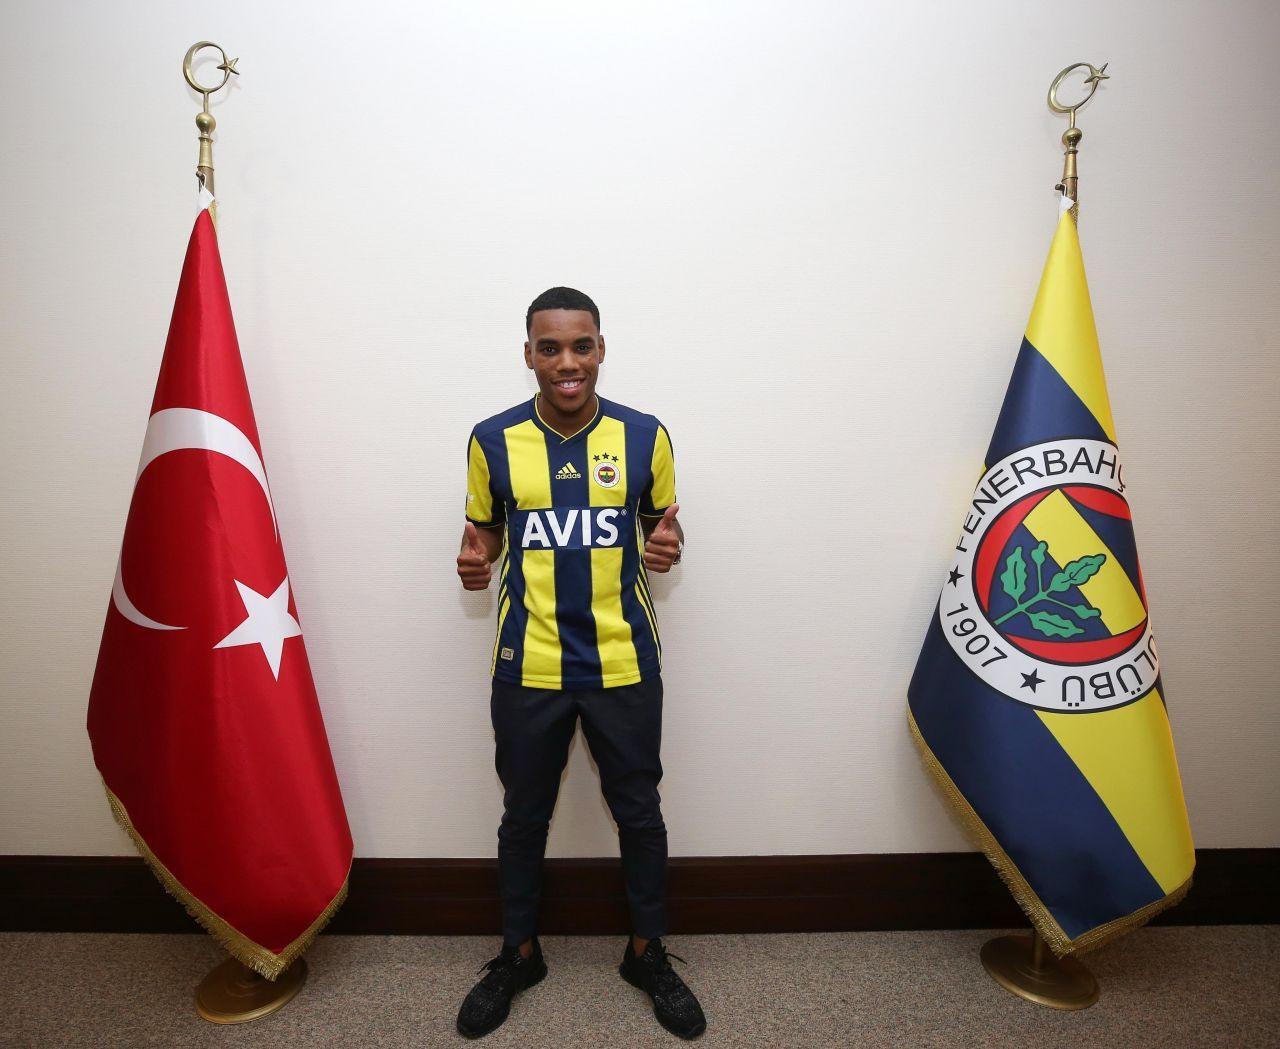 Rodriges Fenerbahçe'de! Transfer resmen açıklandı - Page 2